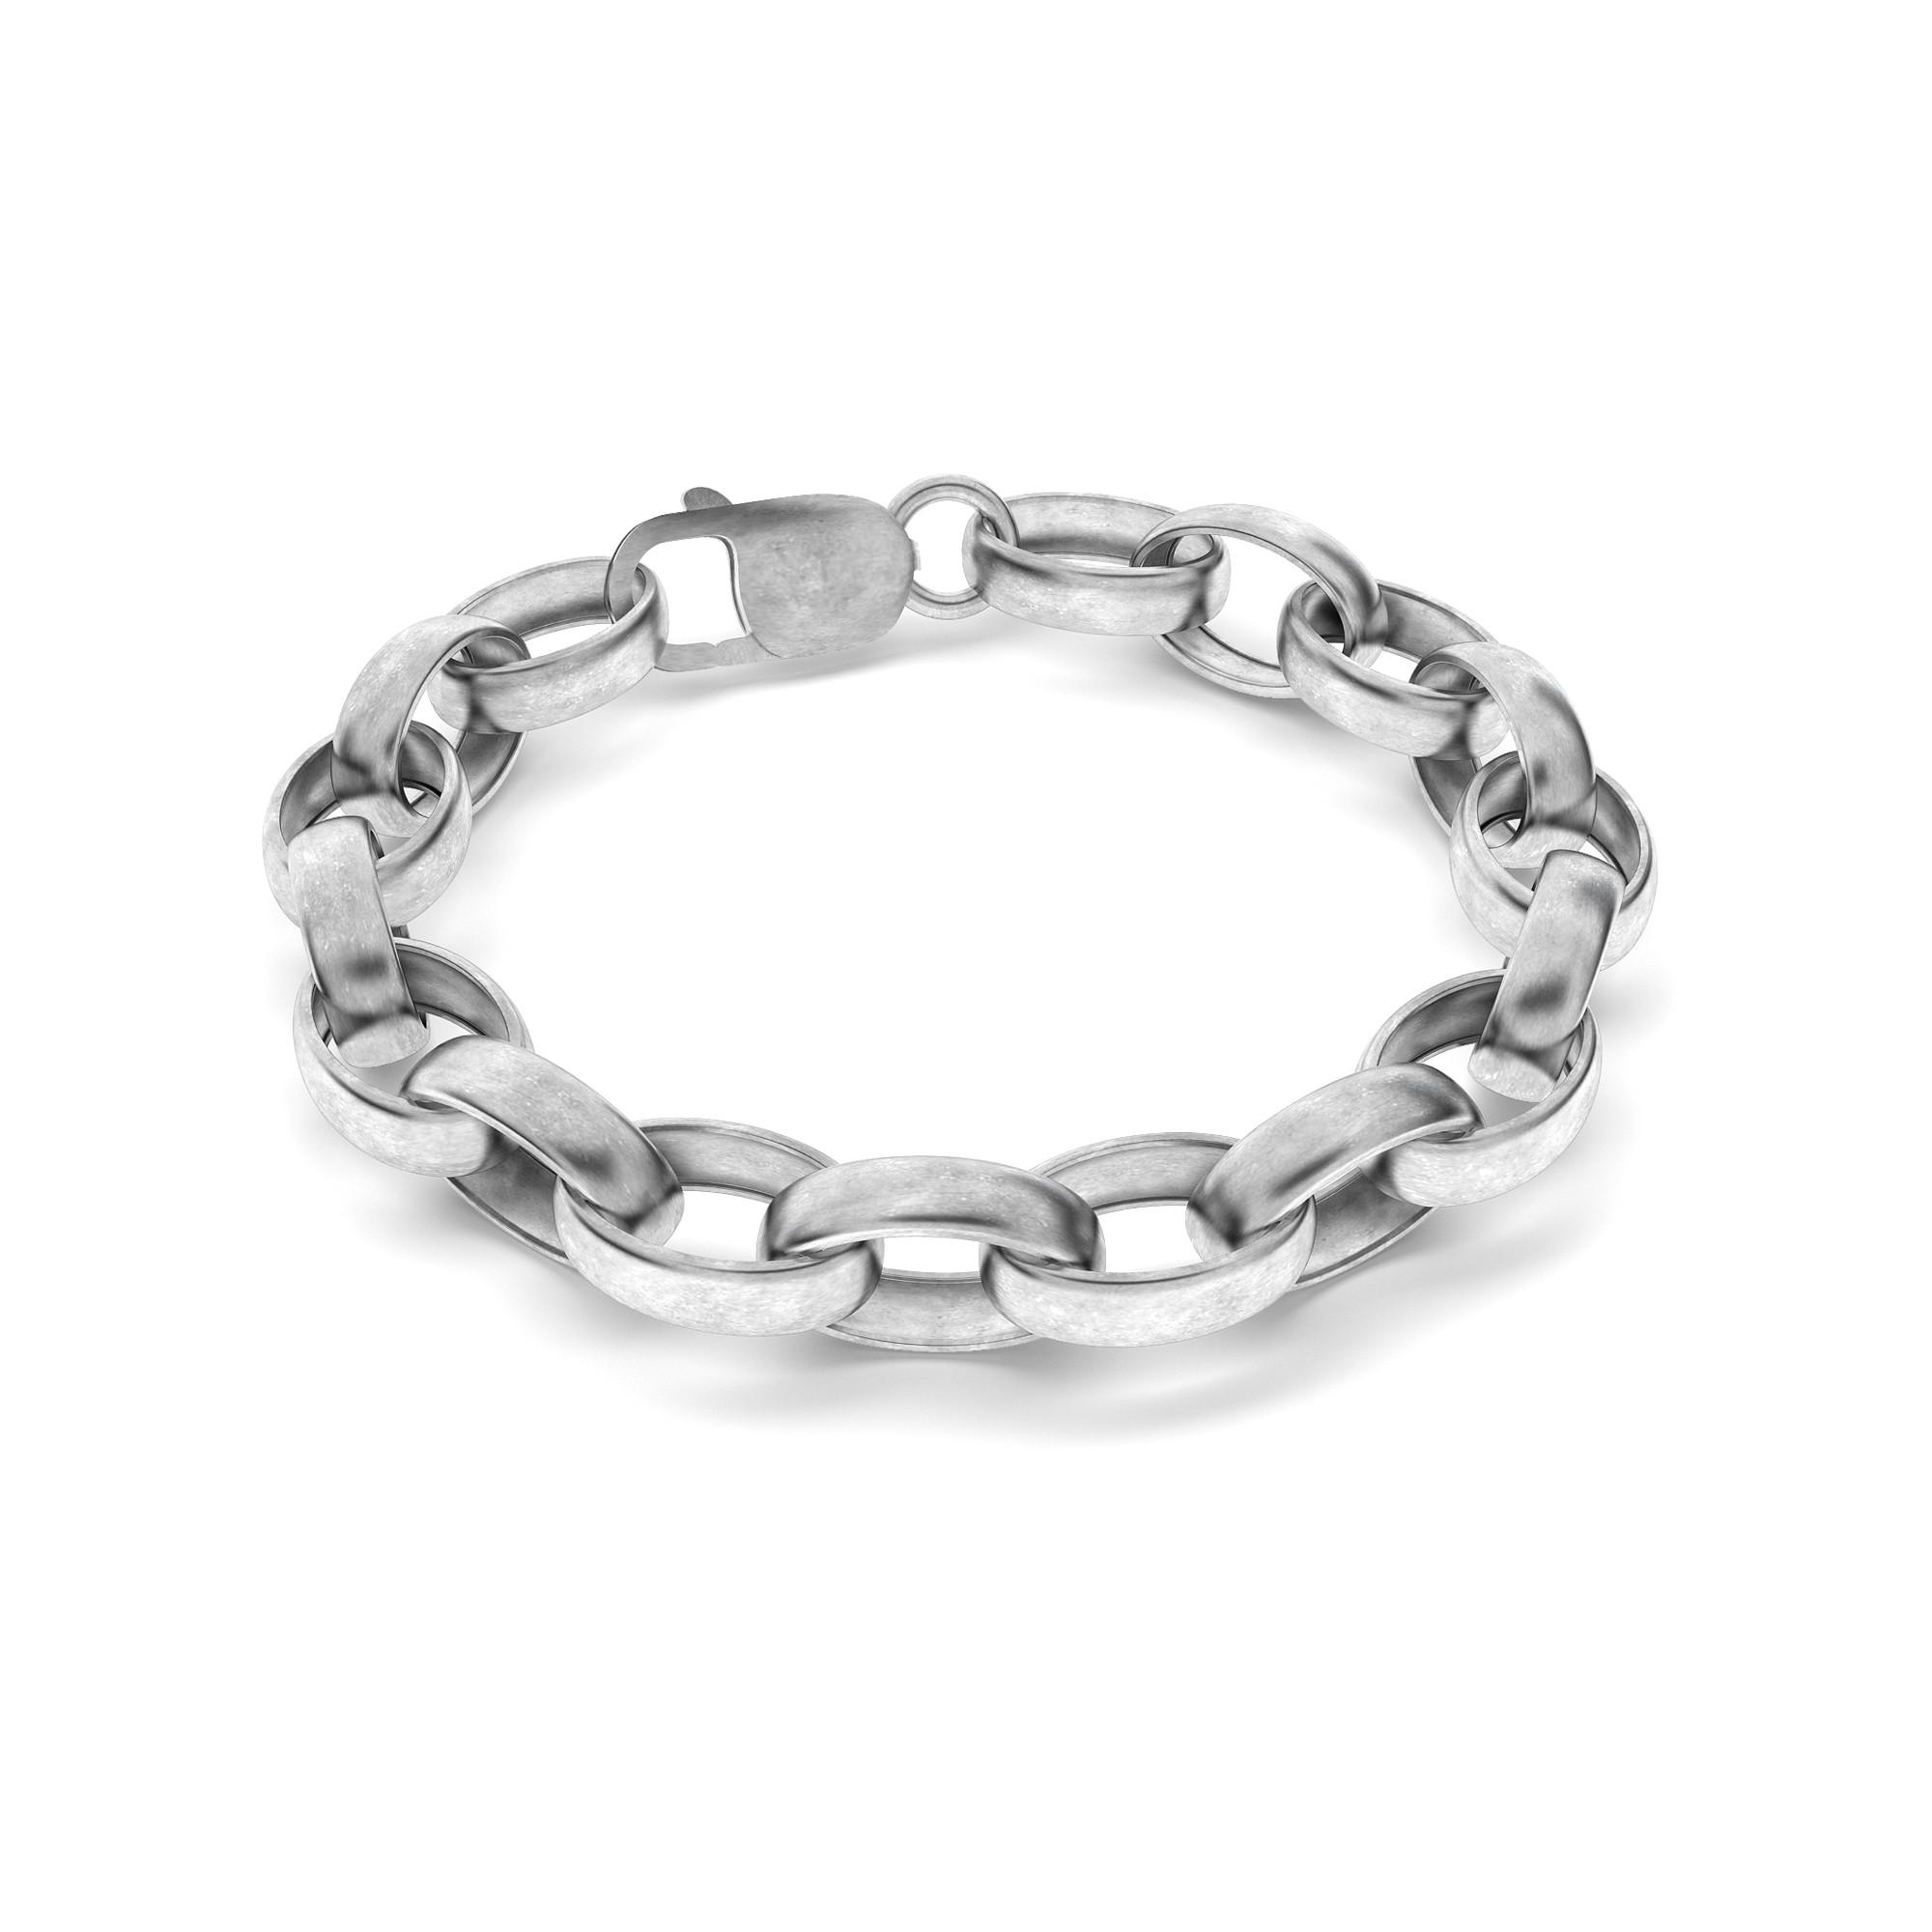 Srebrny gruba bransoletka satynowana 925